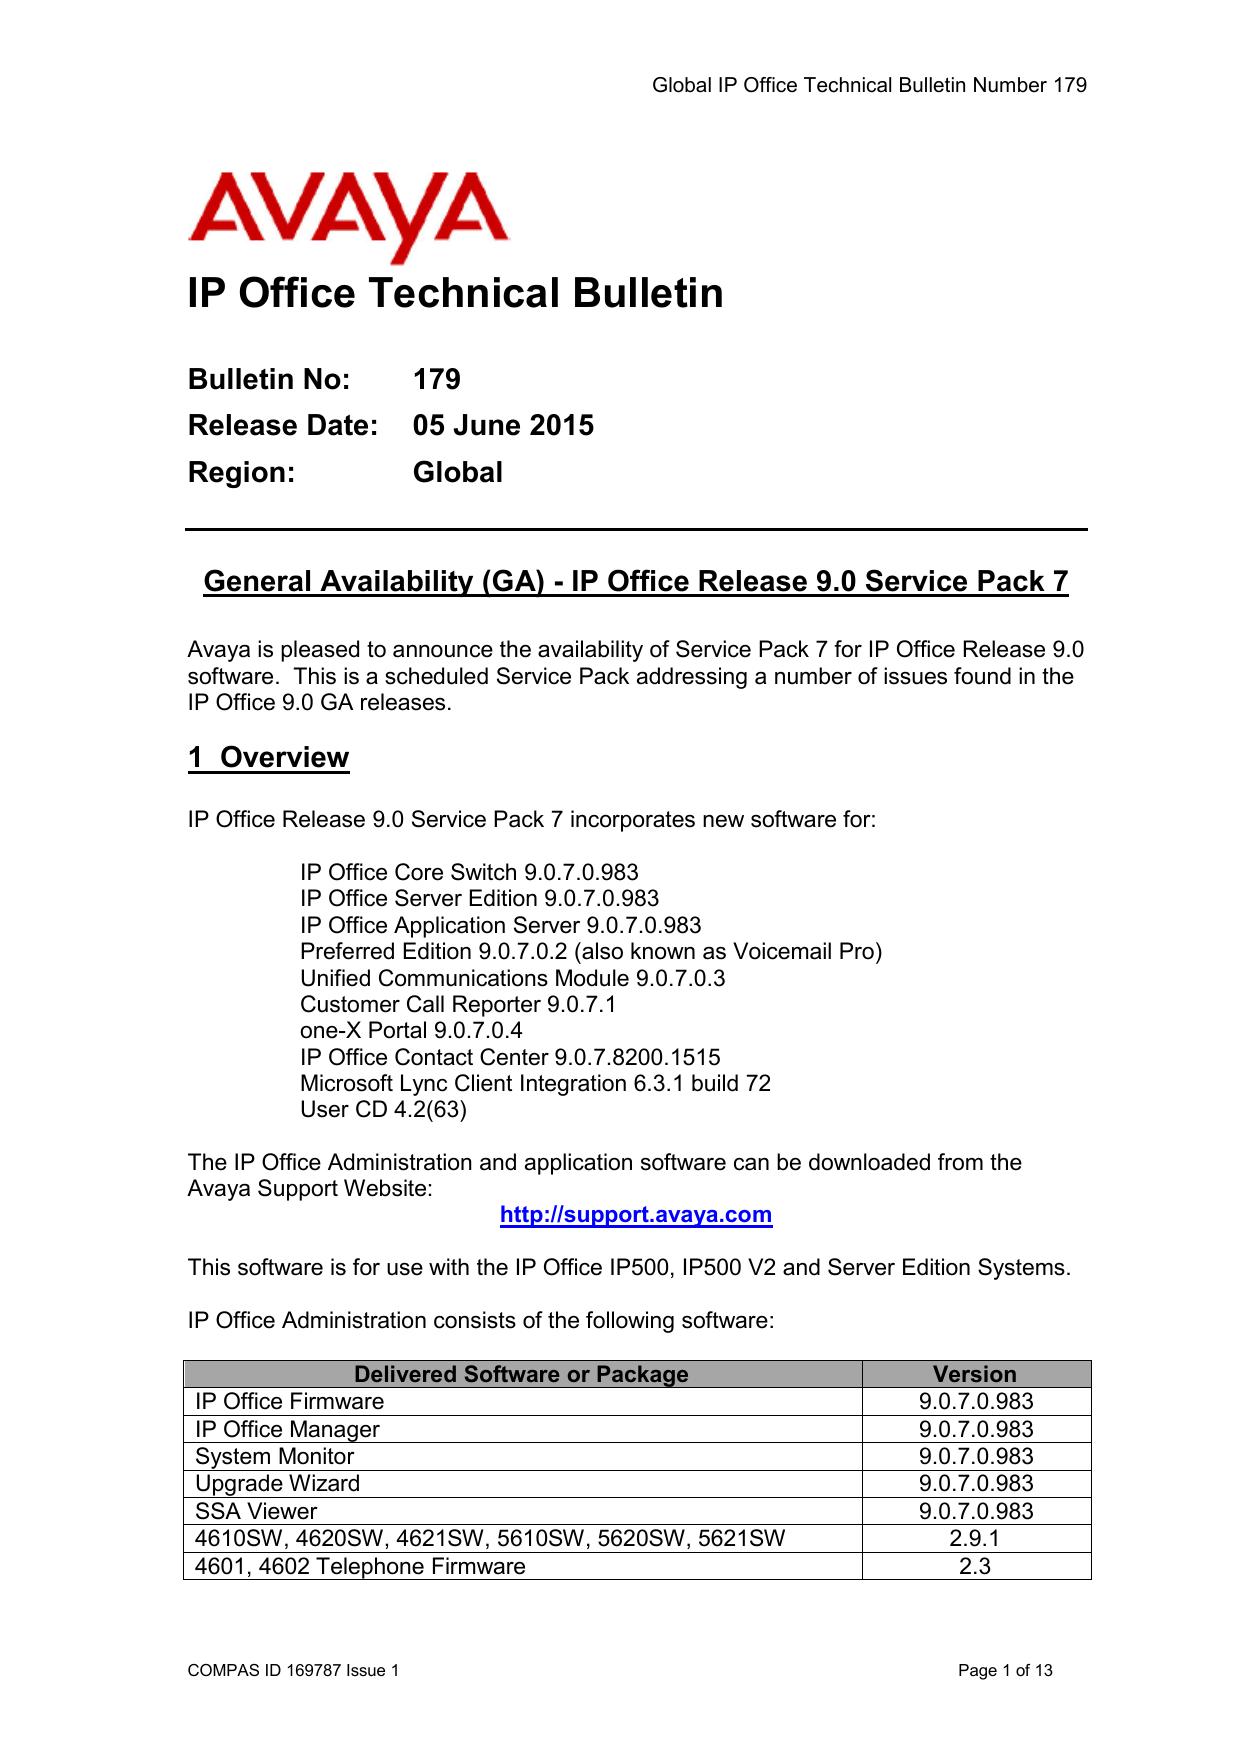 Global IP Office Technical Bulletin 179 - ipoffice